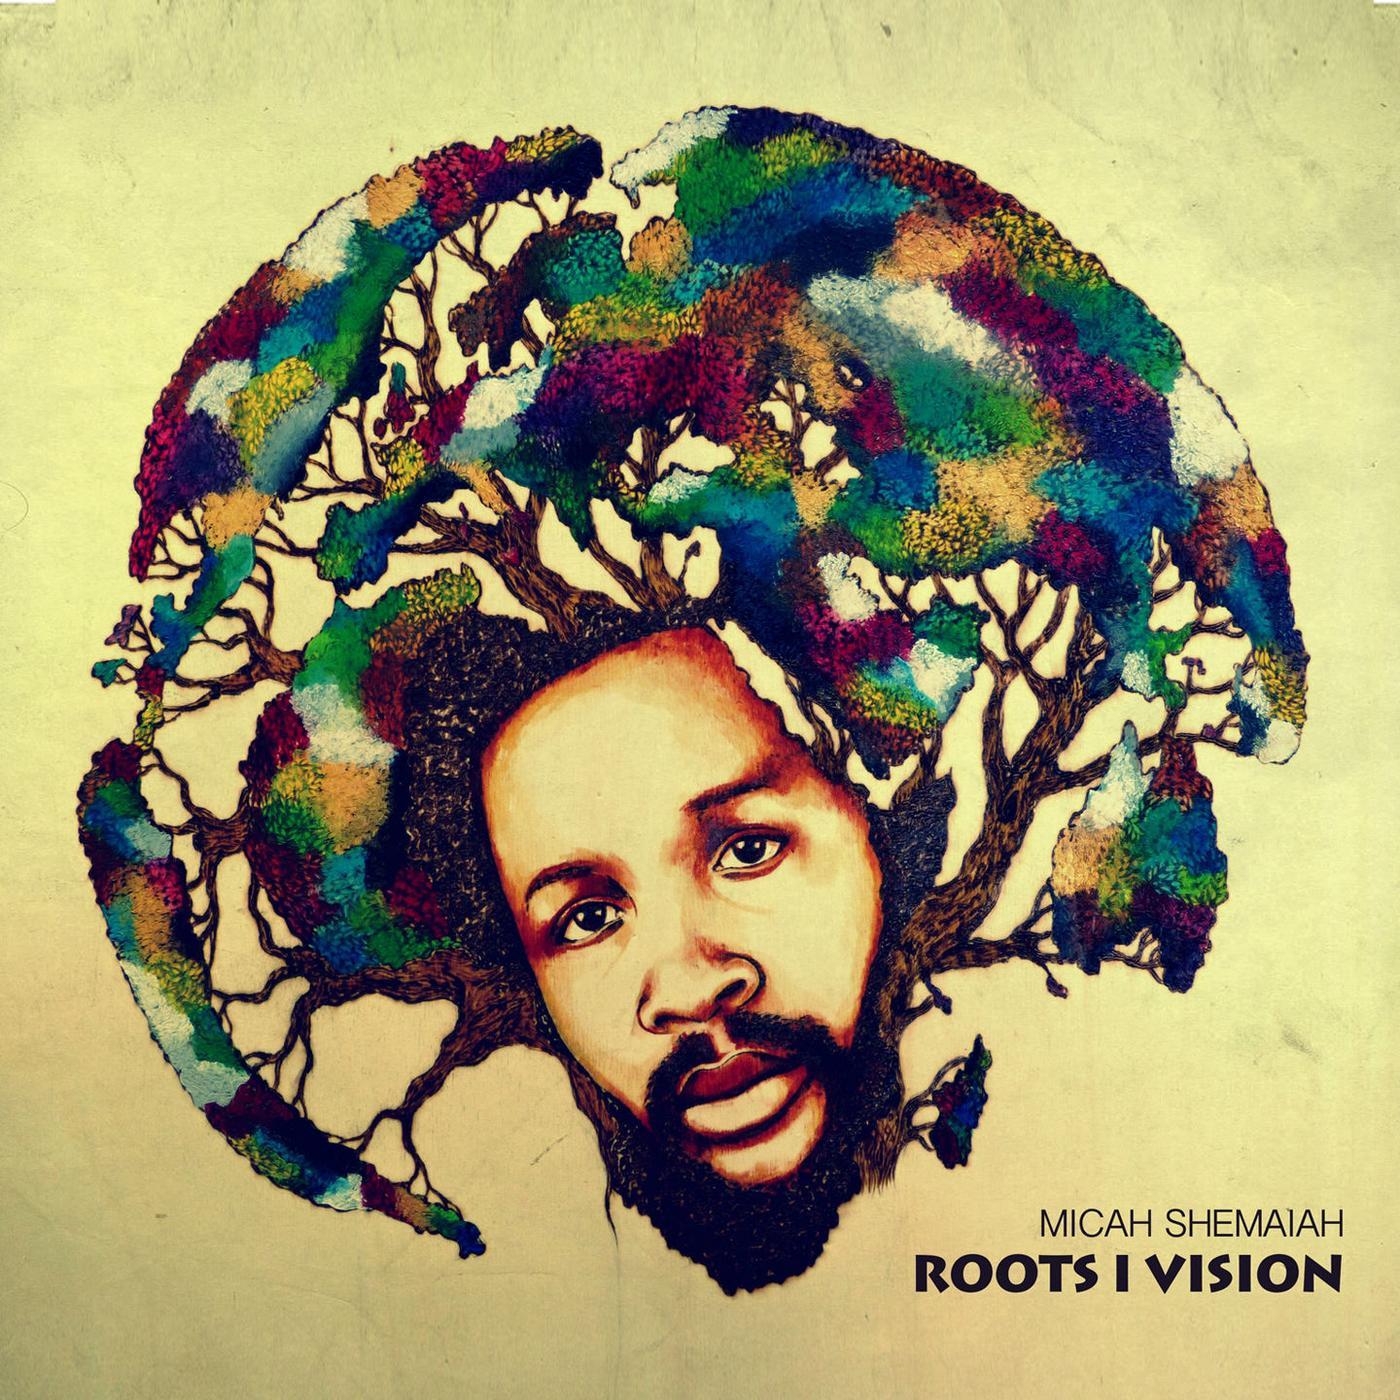 Micah Shemaiah - Roots I Vision (2018) - Rasta Reggae Sounds